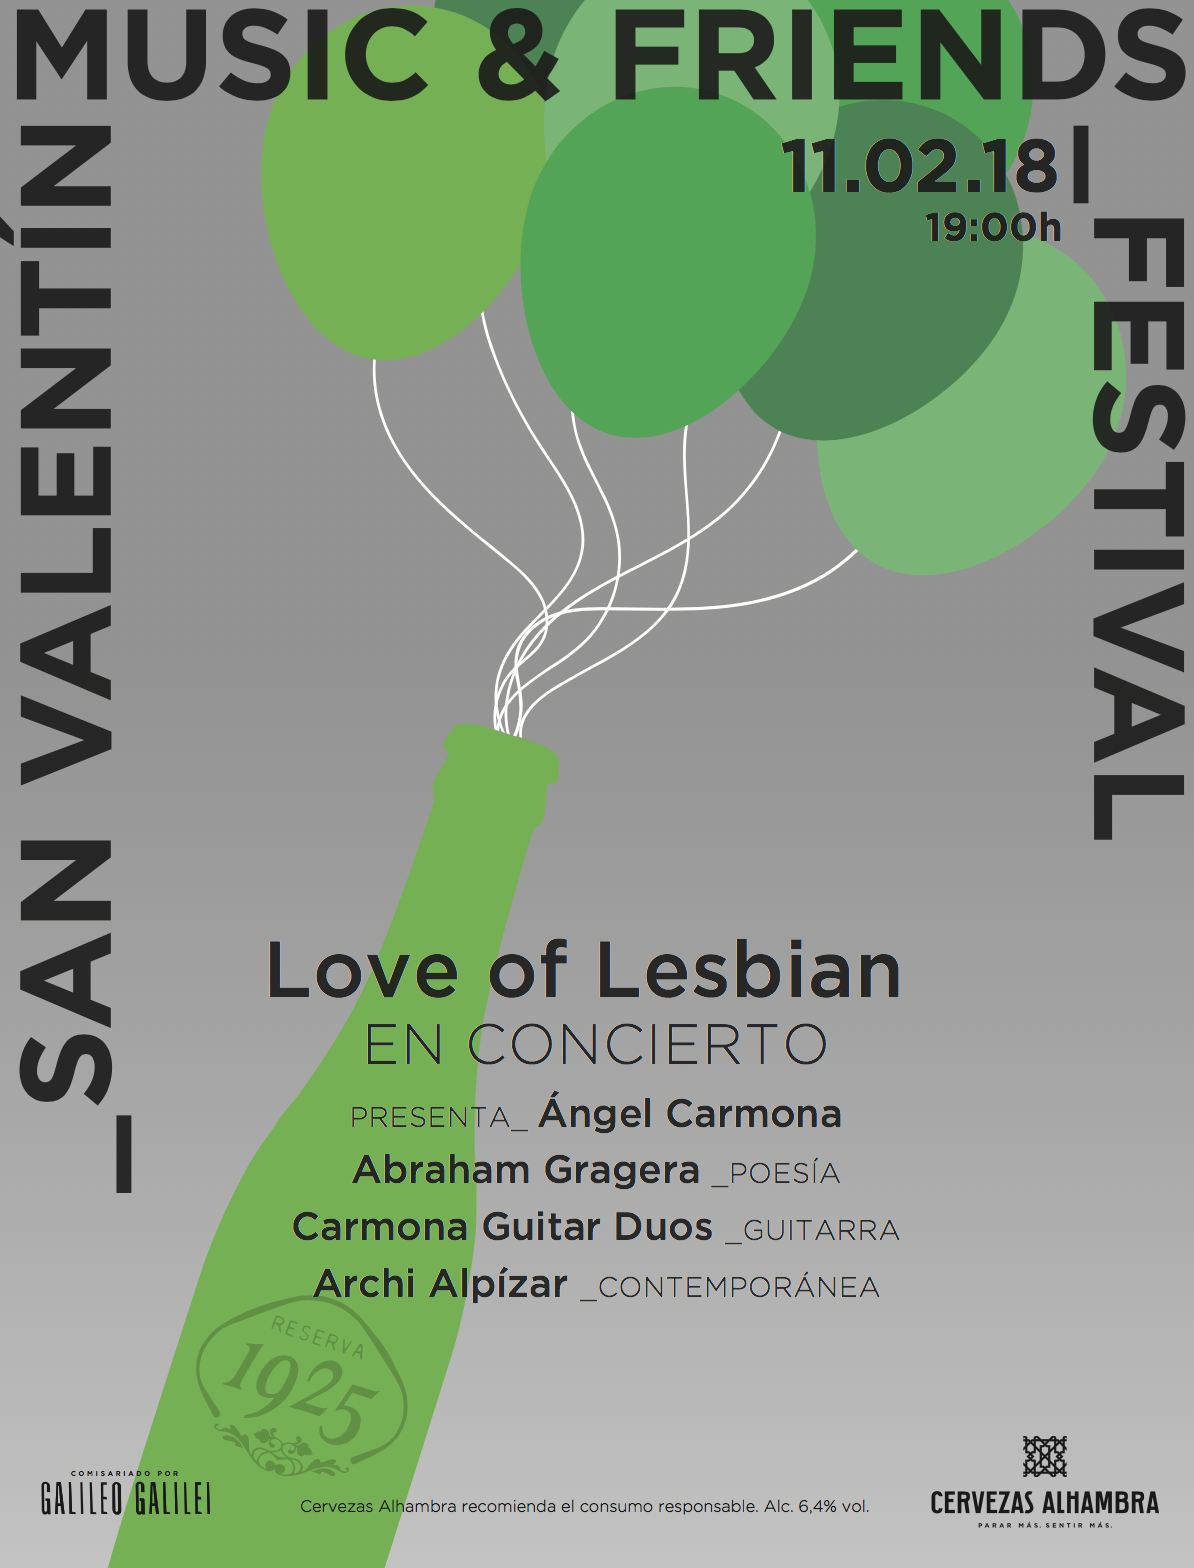 Festival de San Valentín Music & Friends celebra su tercera edición